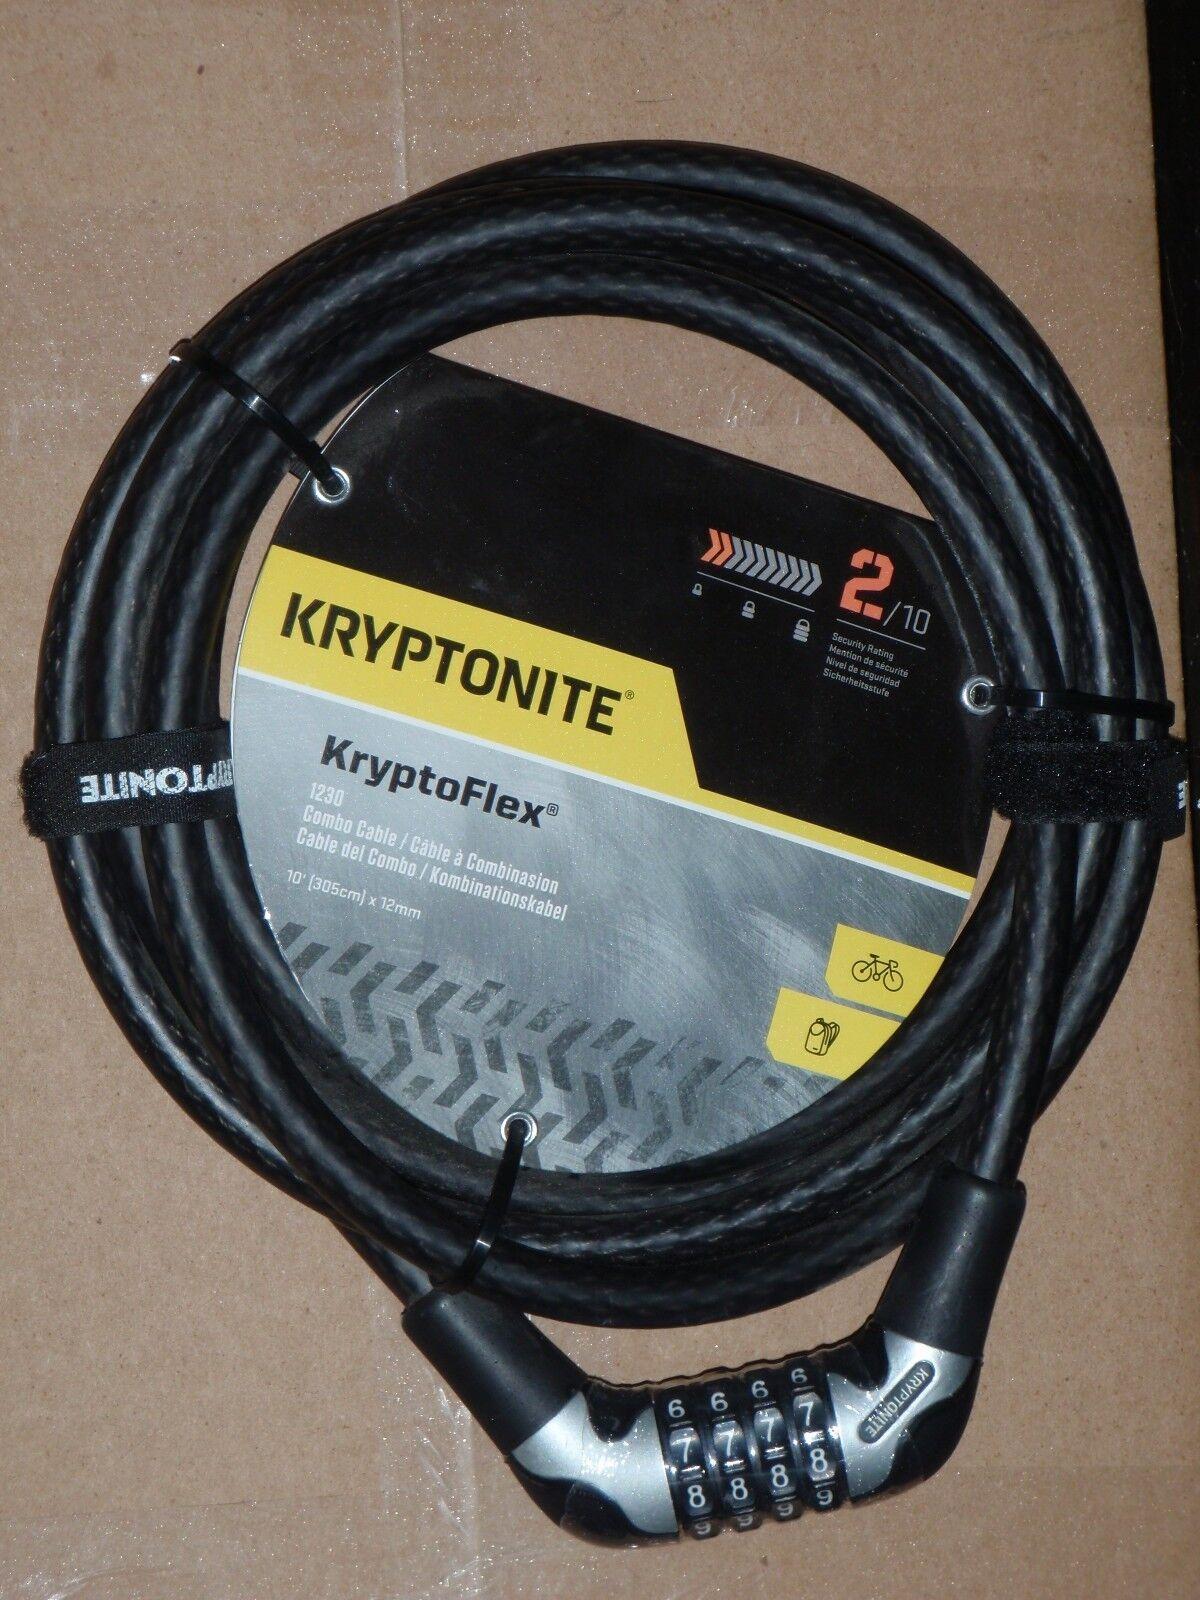 Kryptonite Kryptoflex 1230 Combo Cable 12mm Bicycle Lock Bik